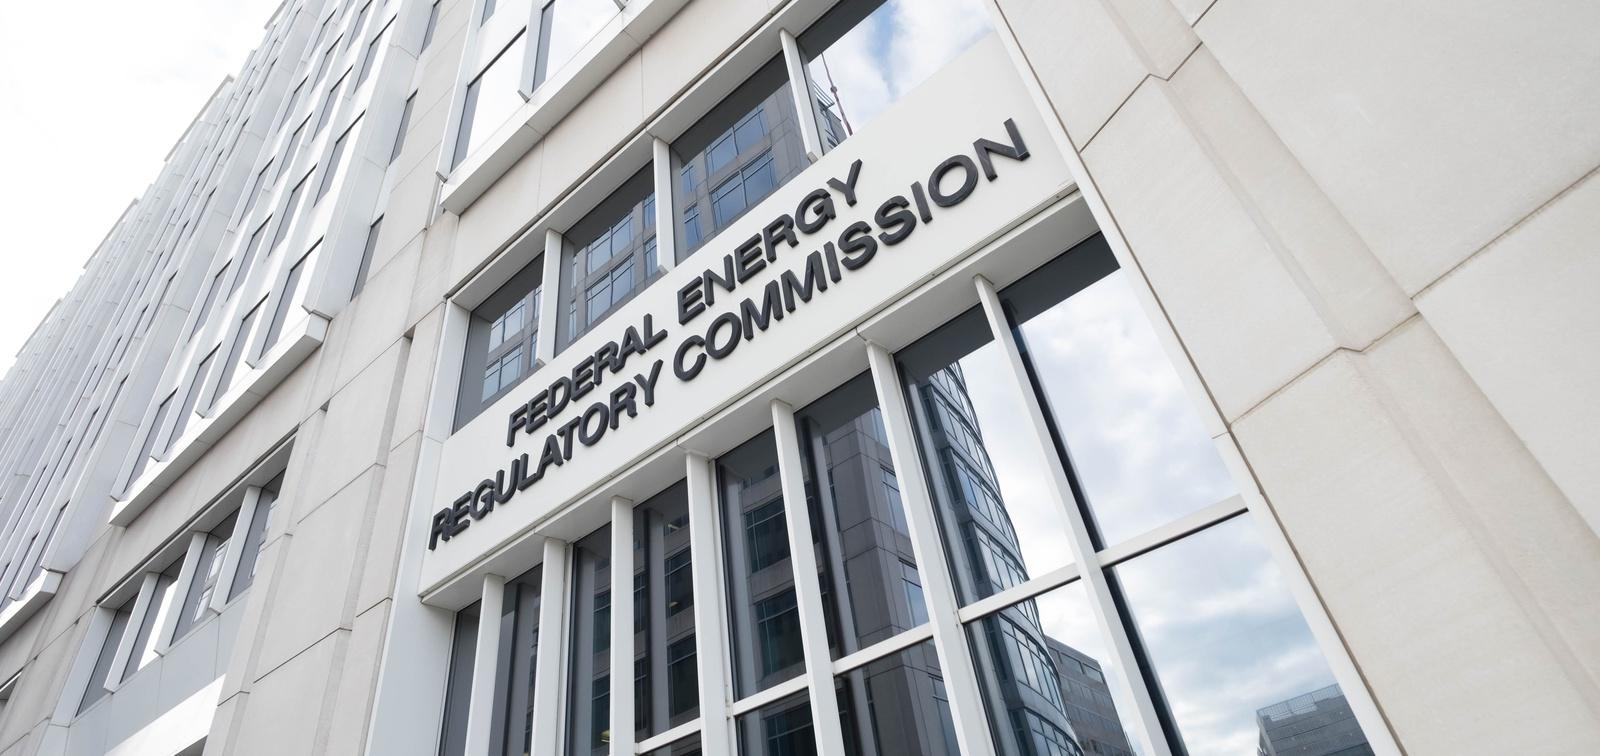 FERC approves PJM reserve overhaul with $2B pricetag, critics say move ignores overcapacity